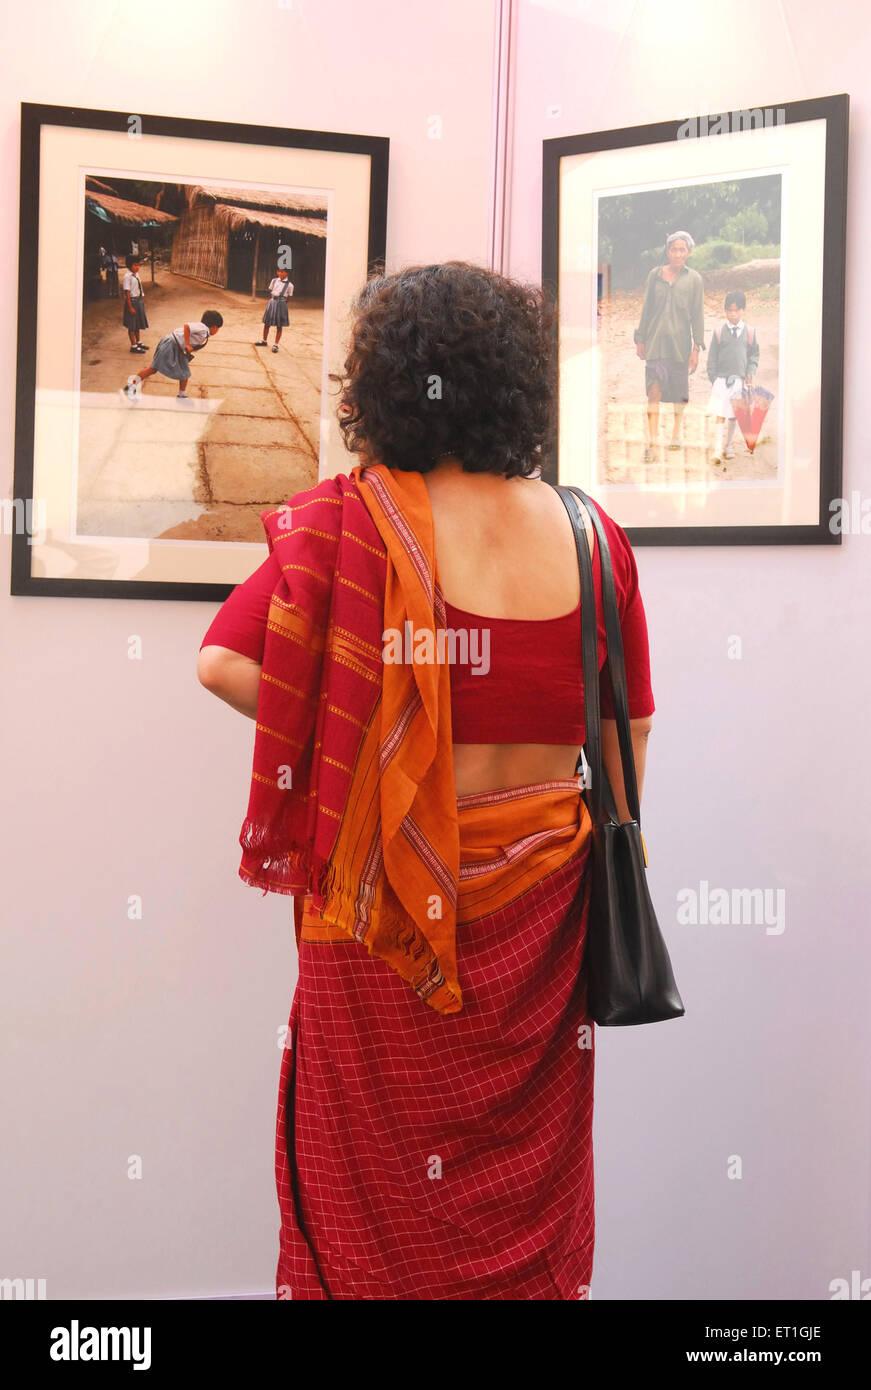 Dame regardant des photographies; New Delhi, Inde; Photo Stock